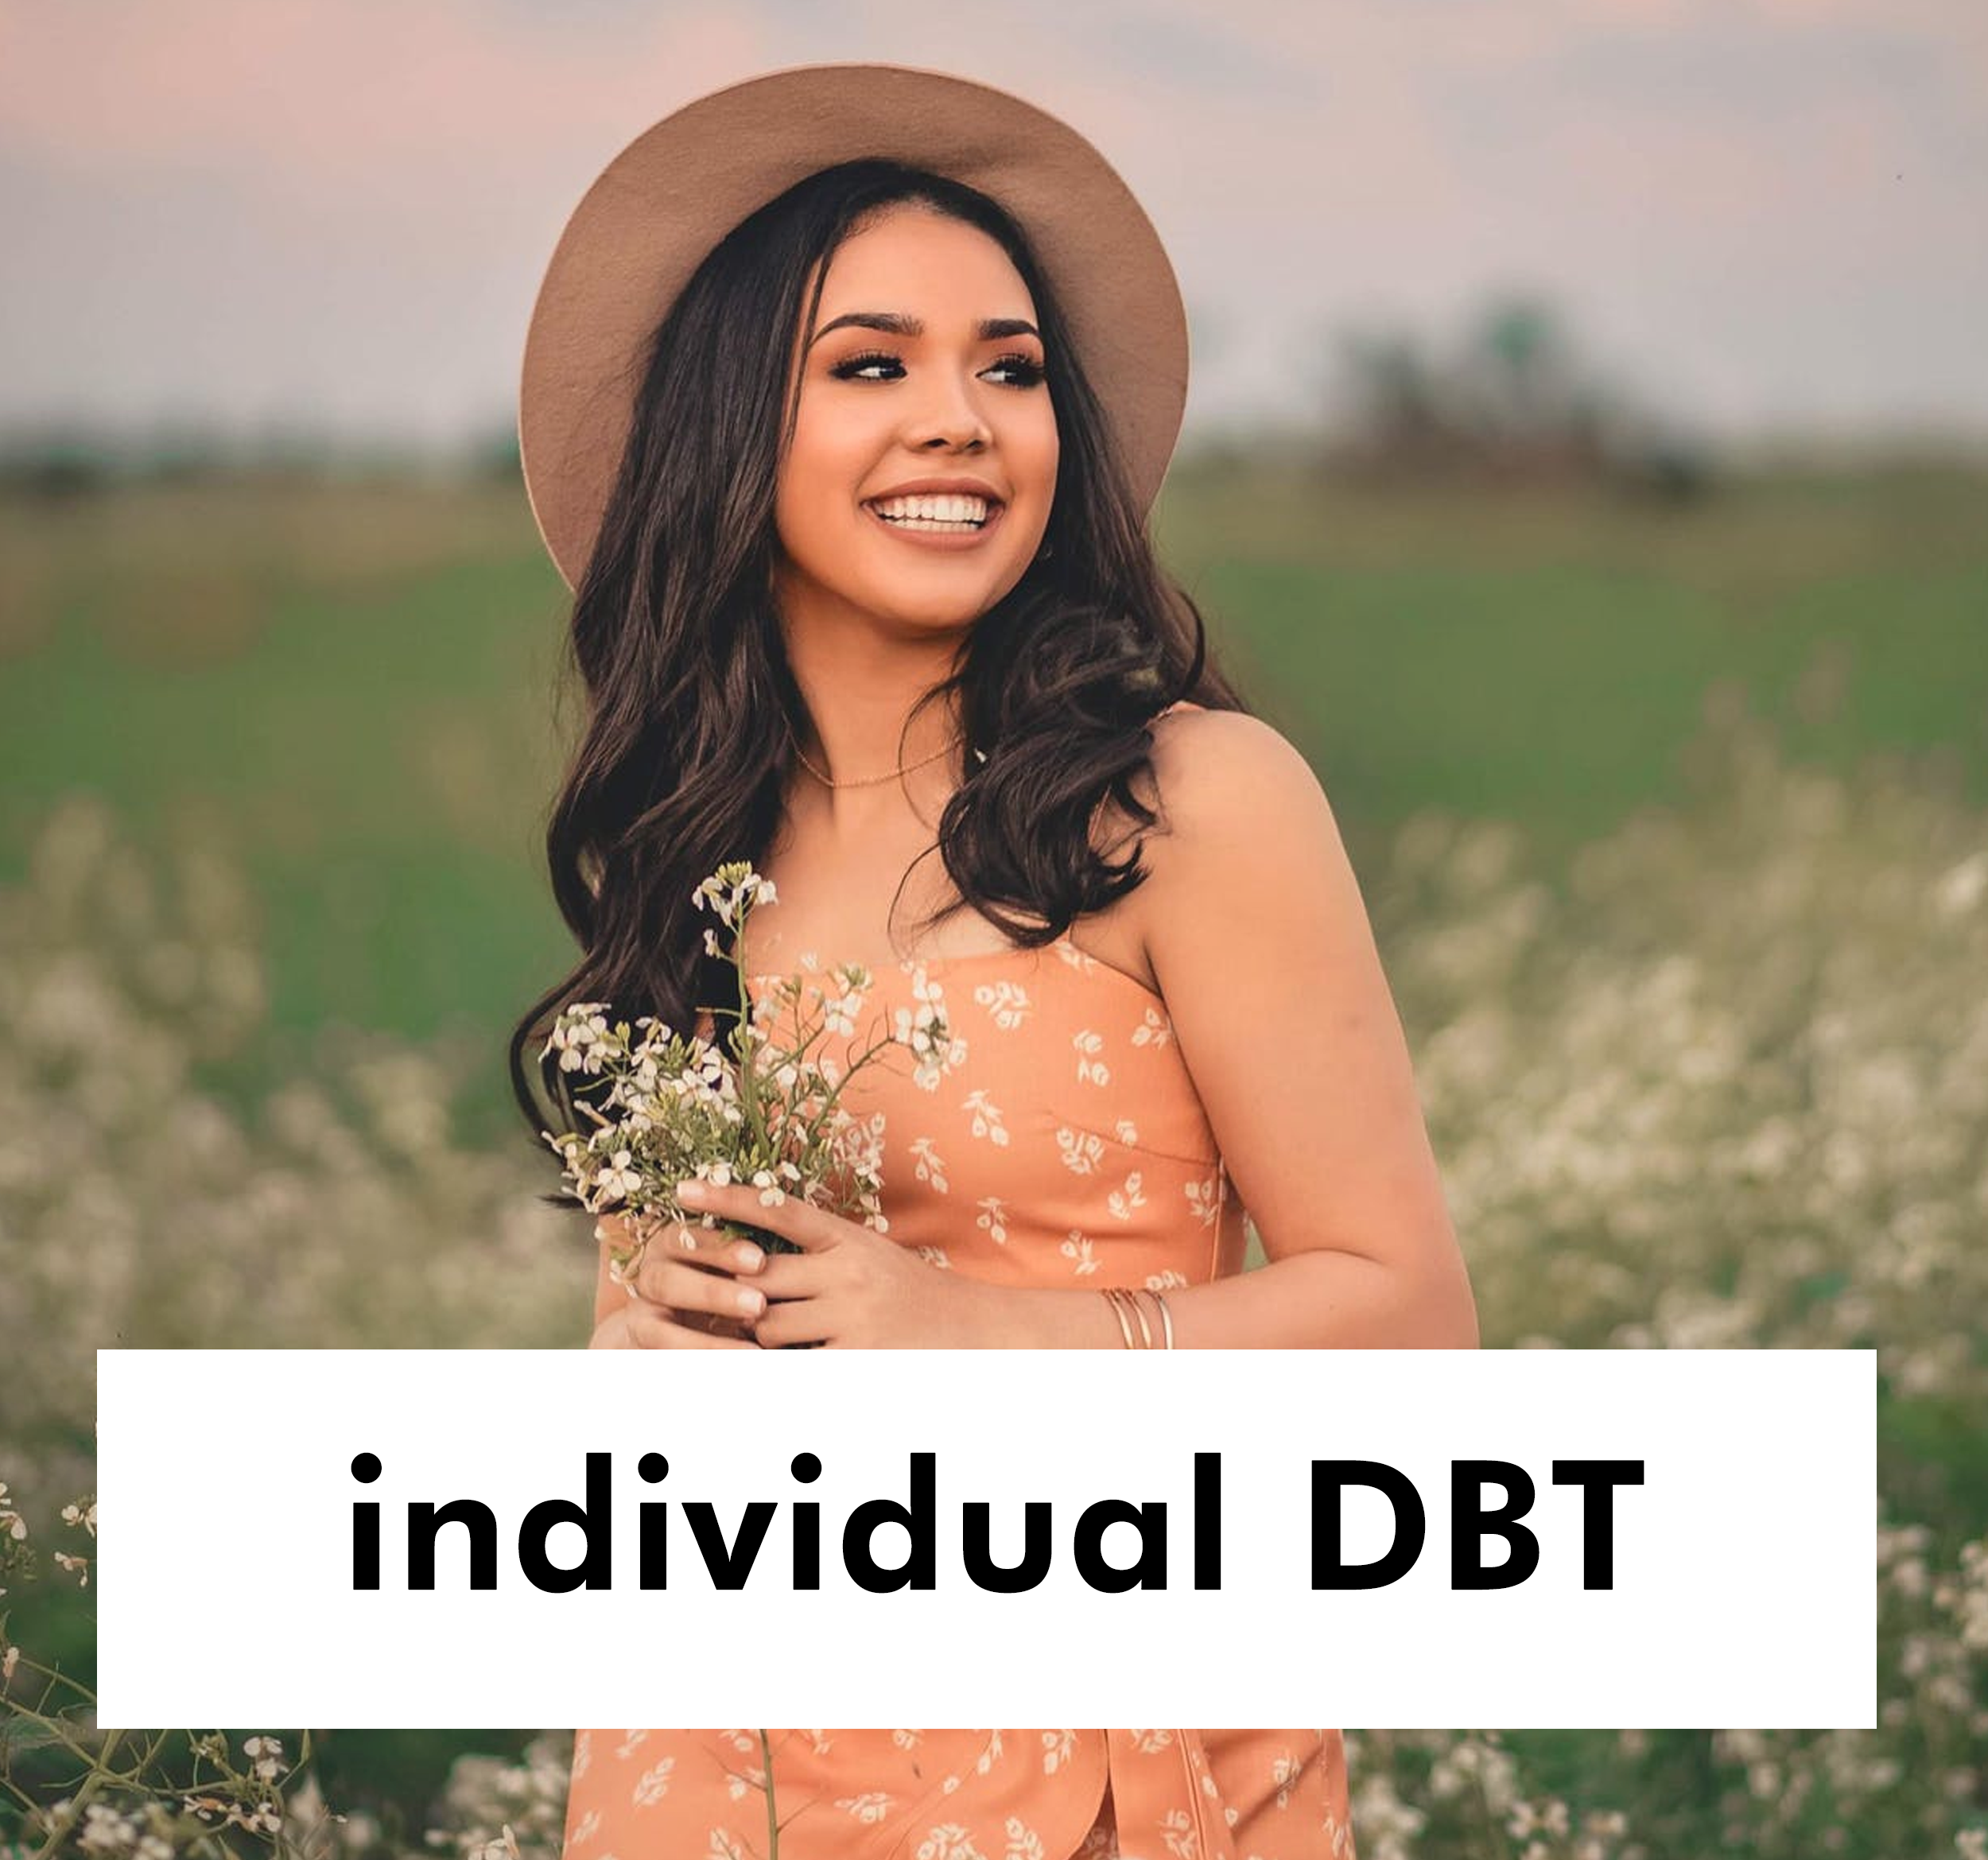 DBTindividual